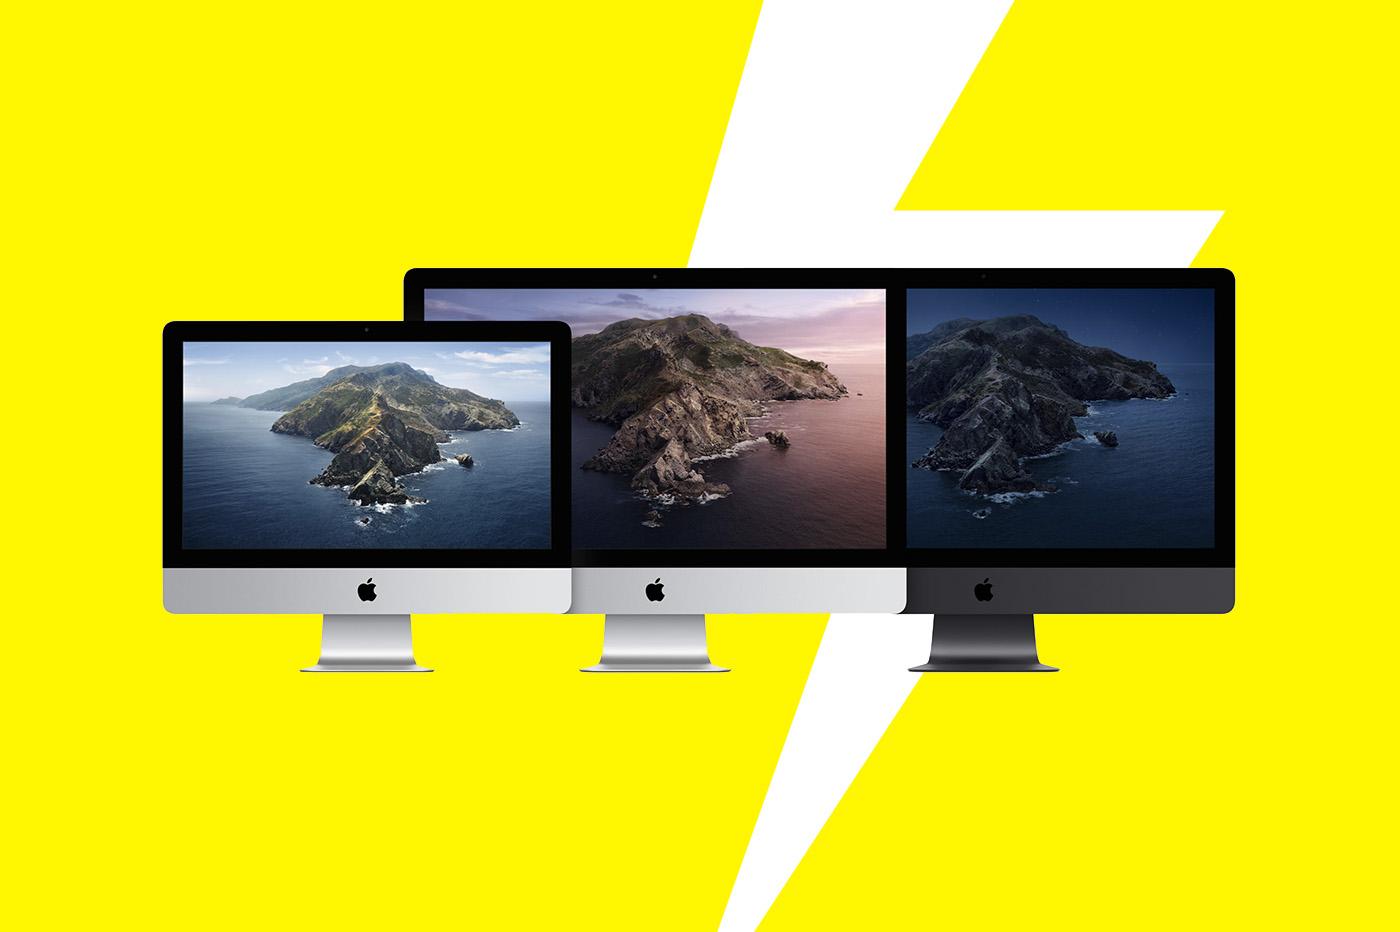 Comparatif iMac vs iMac Pro